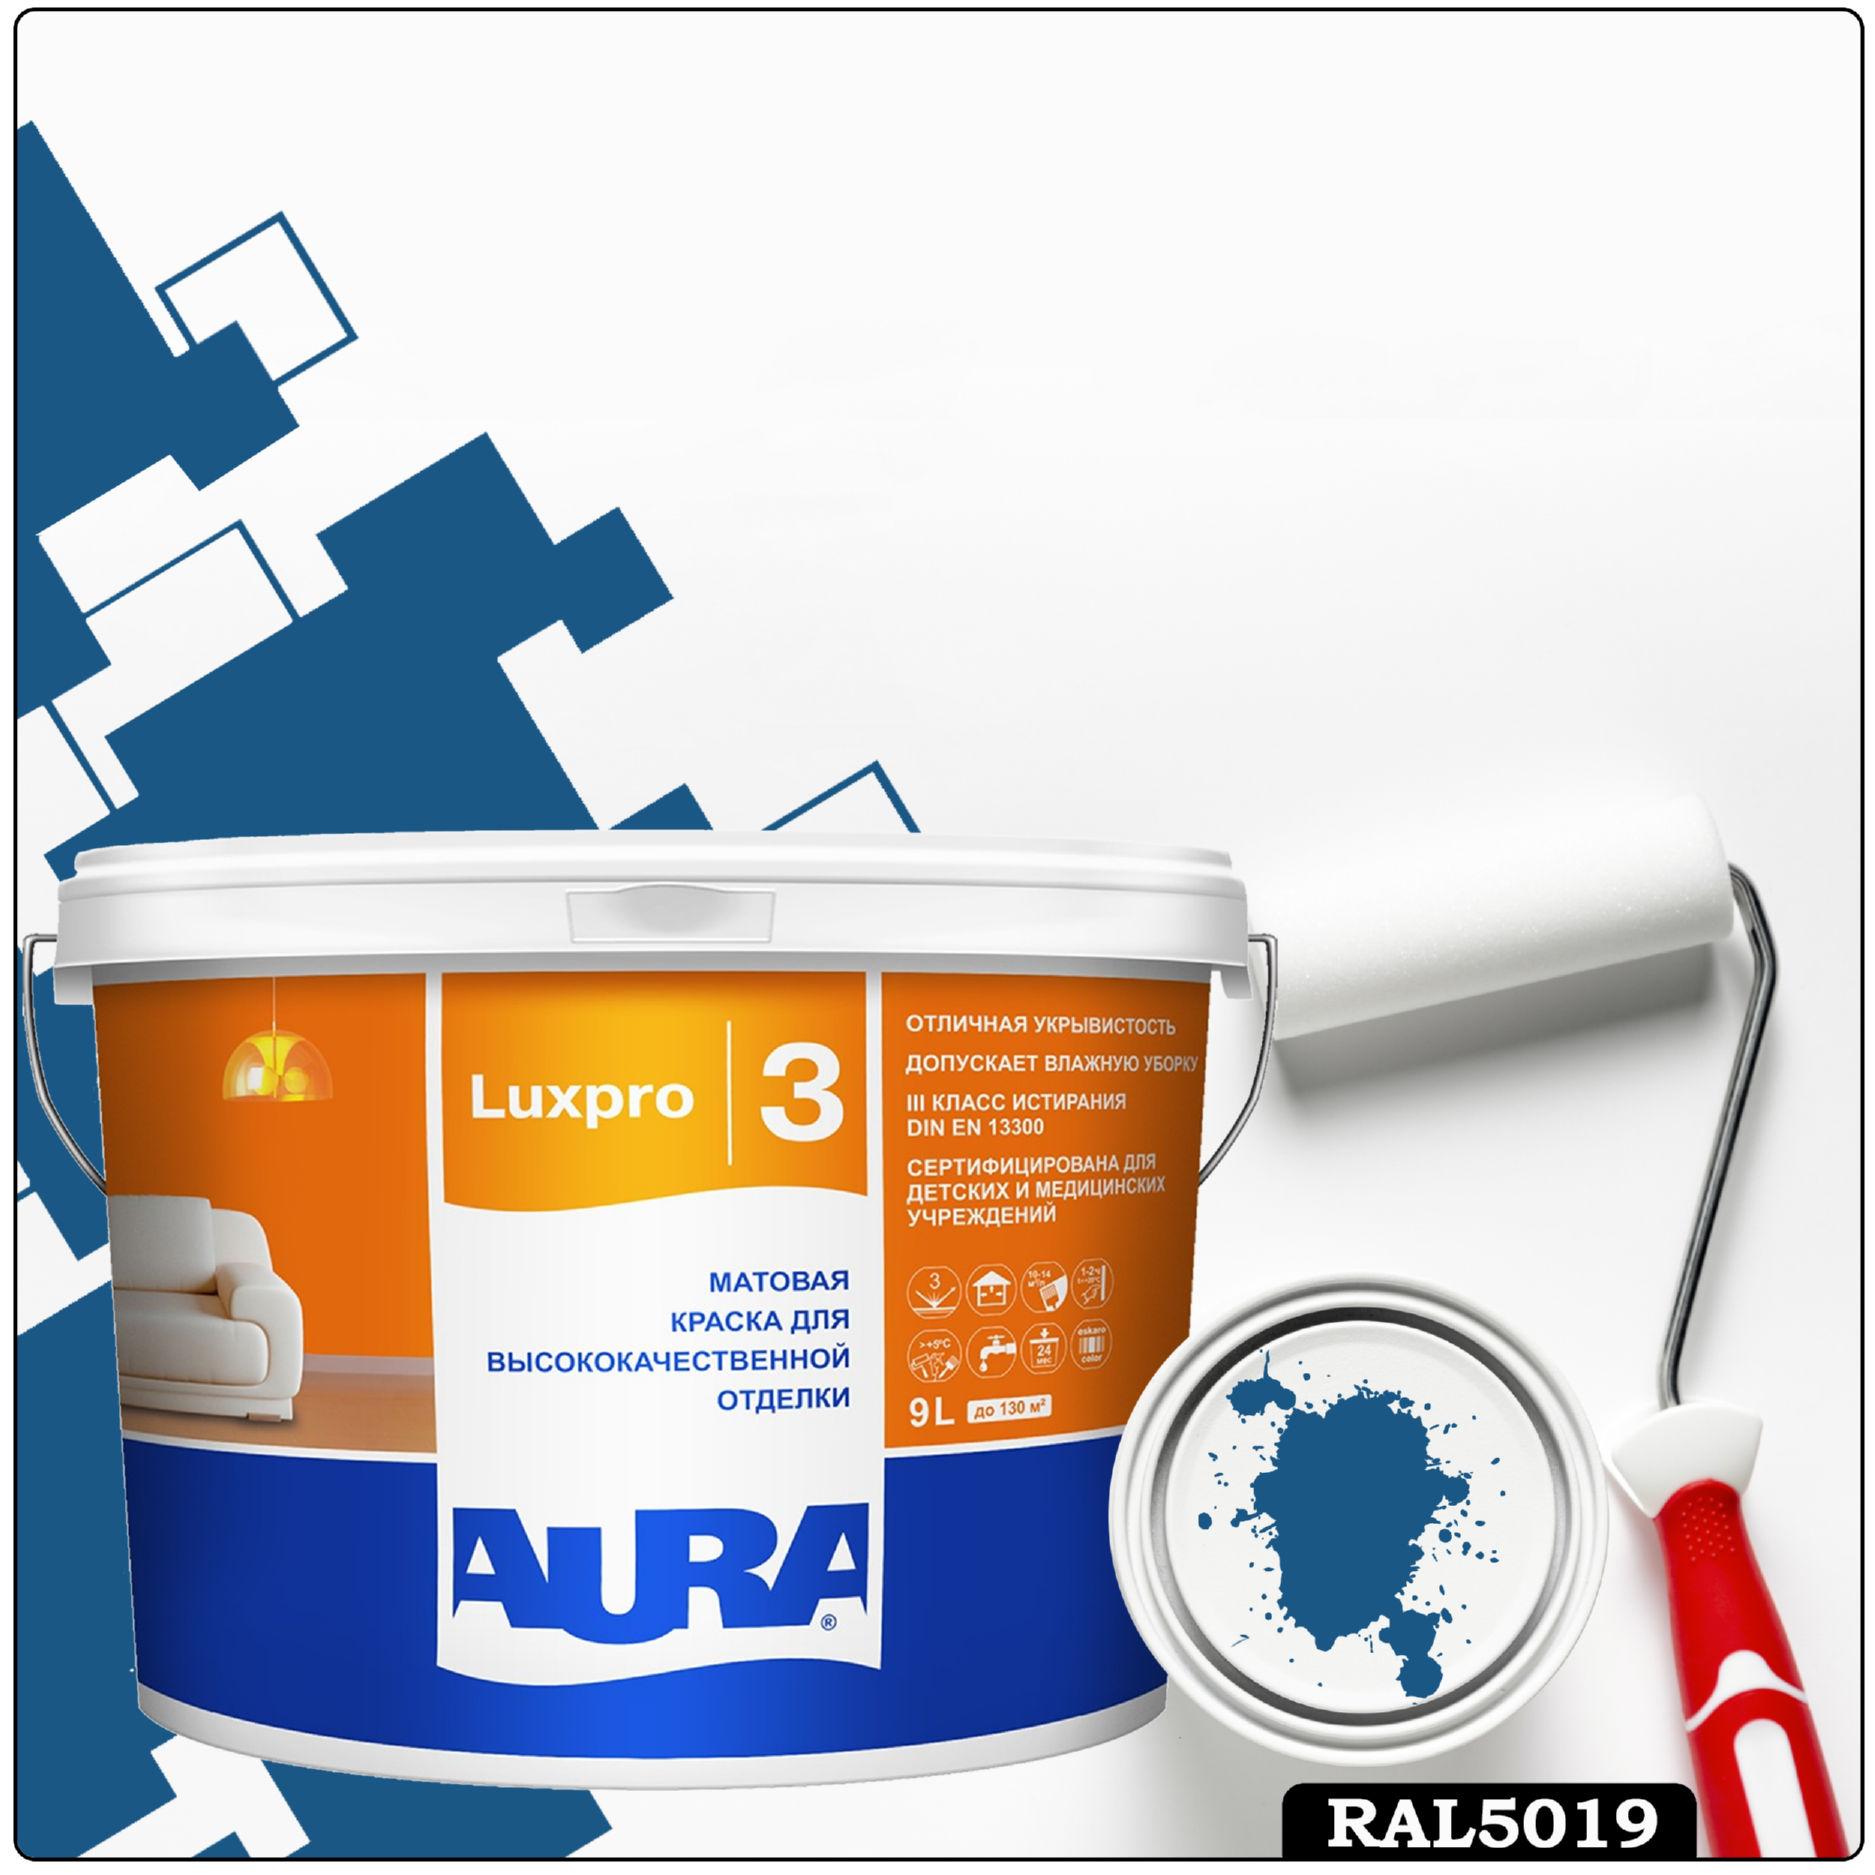 Фото 18 - Краска Aura LuxPRO 3, RAL 5019 Синий, латексная, шелково-матовая, интерьерная, 9л, Аура.